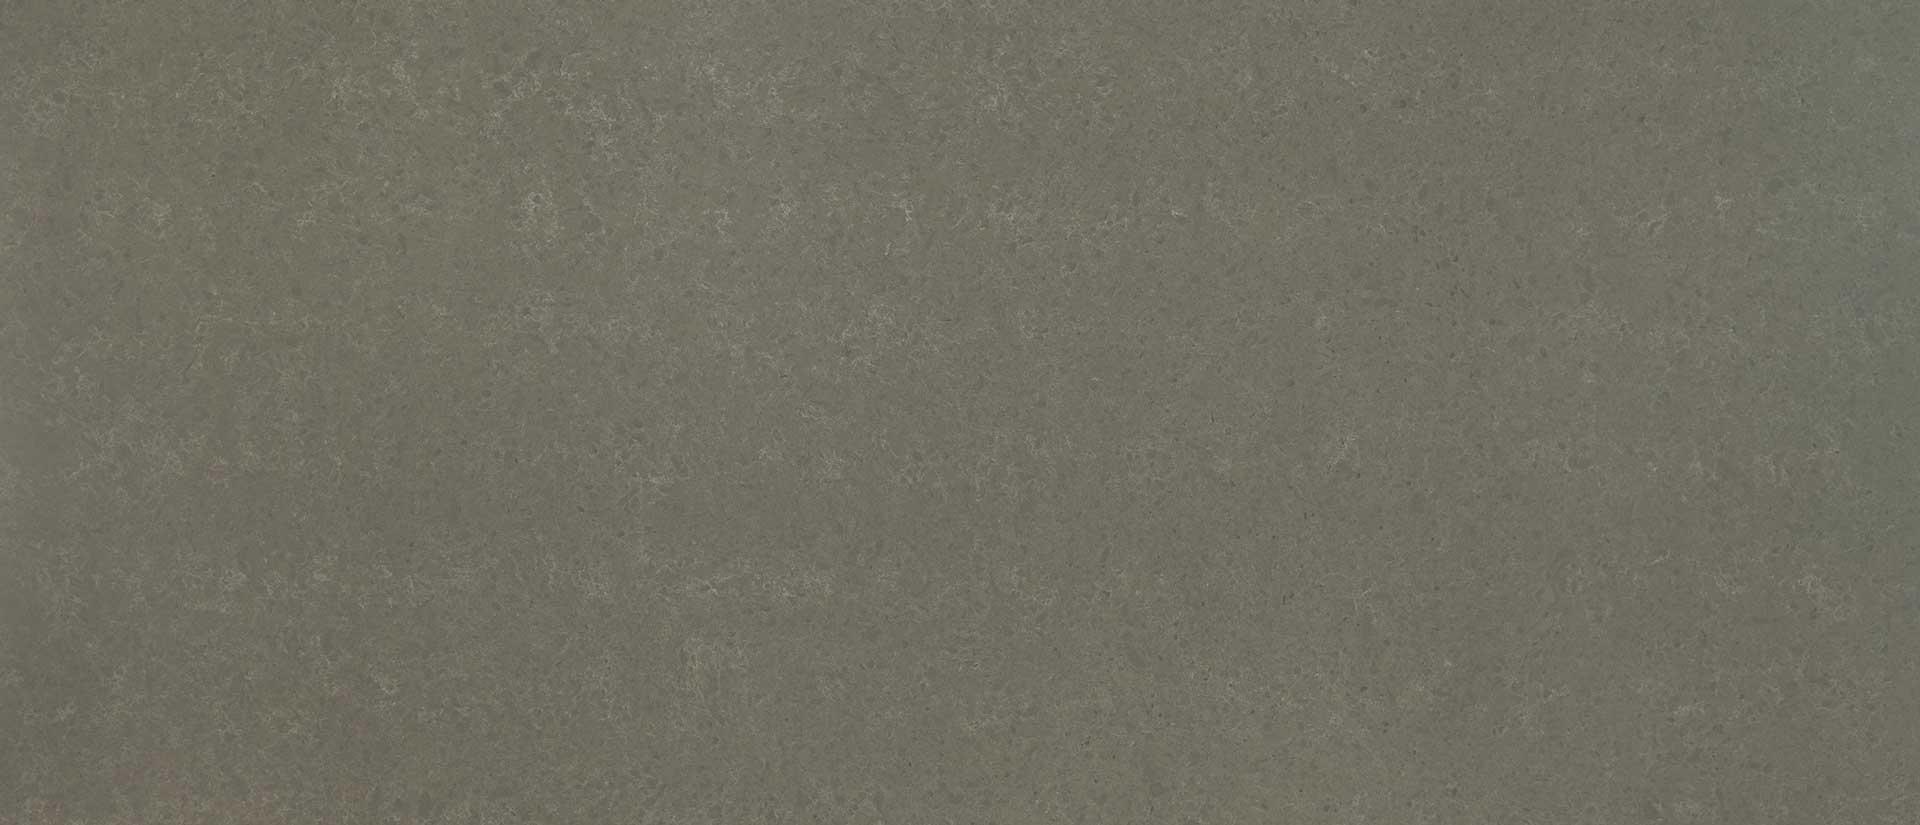 Babylon Gray Concrete Quartz Countertop Kitchen Cabinets